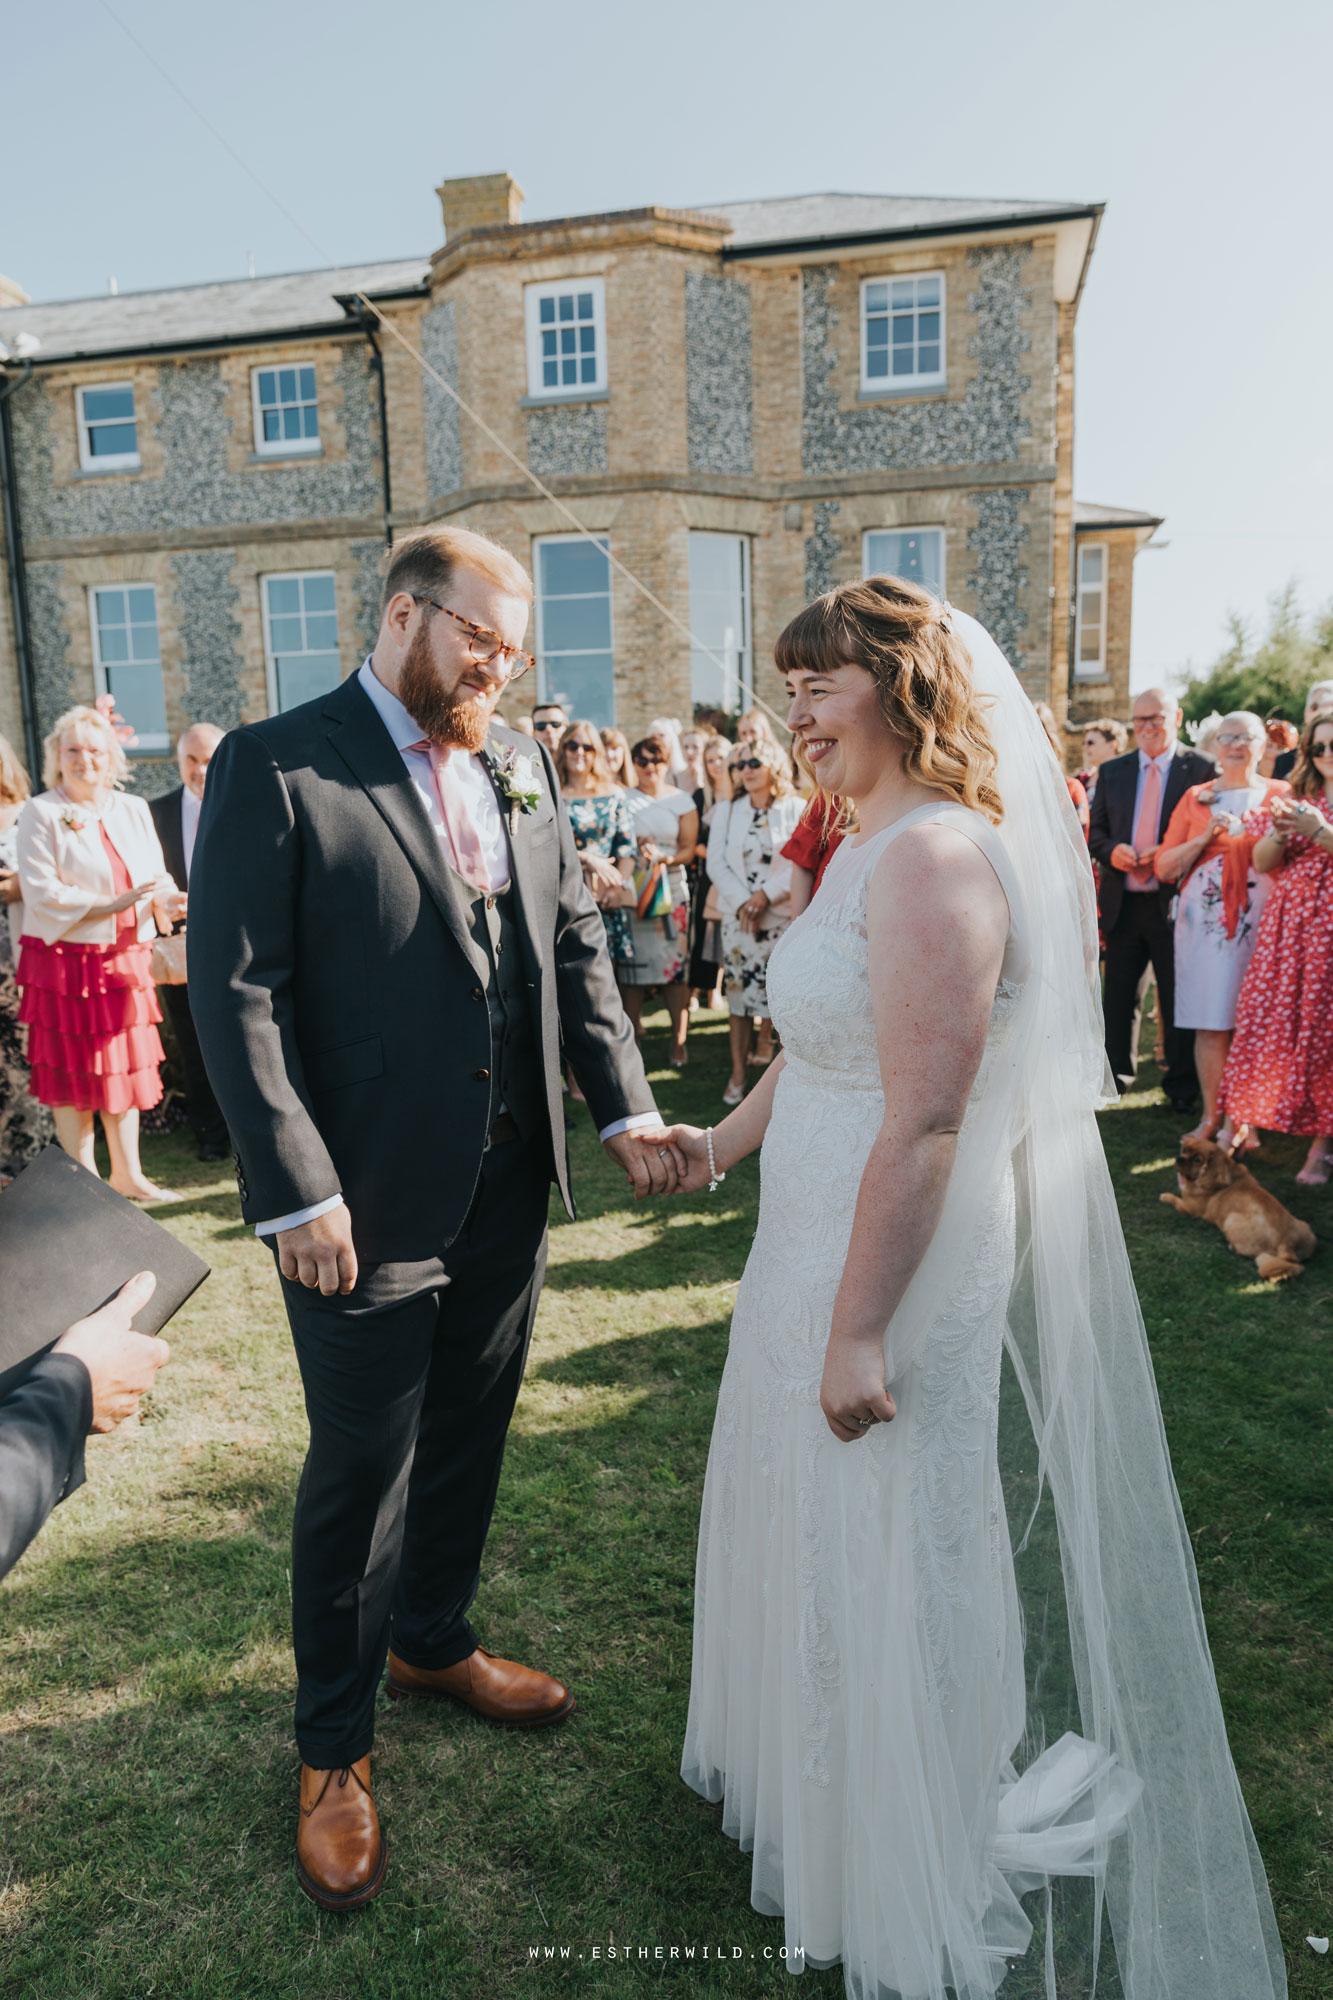 Cromer_Wedding_Beach_Outdoor_Ceremony_Norfolk_North_Lodge_Registry_Office_Rocket_House_Cafe_Cromer_Pier_IMG_3928.jpg